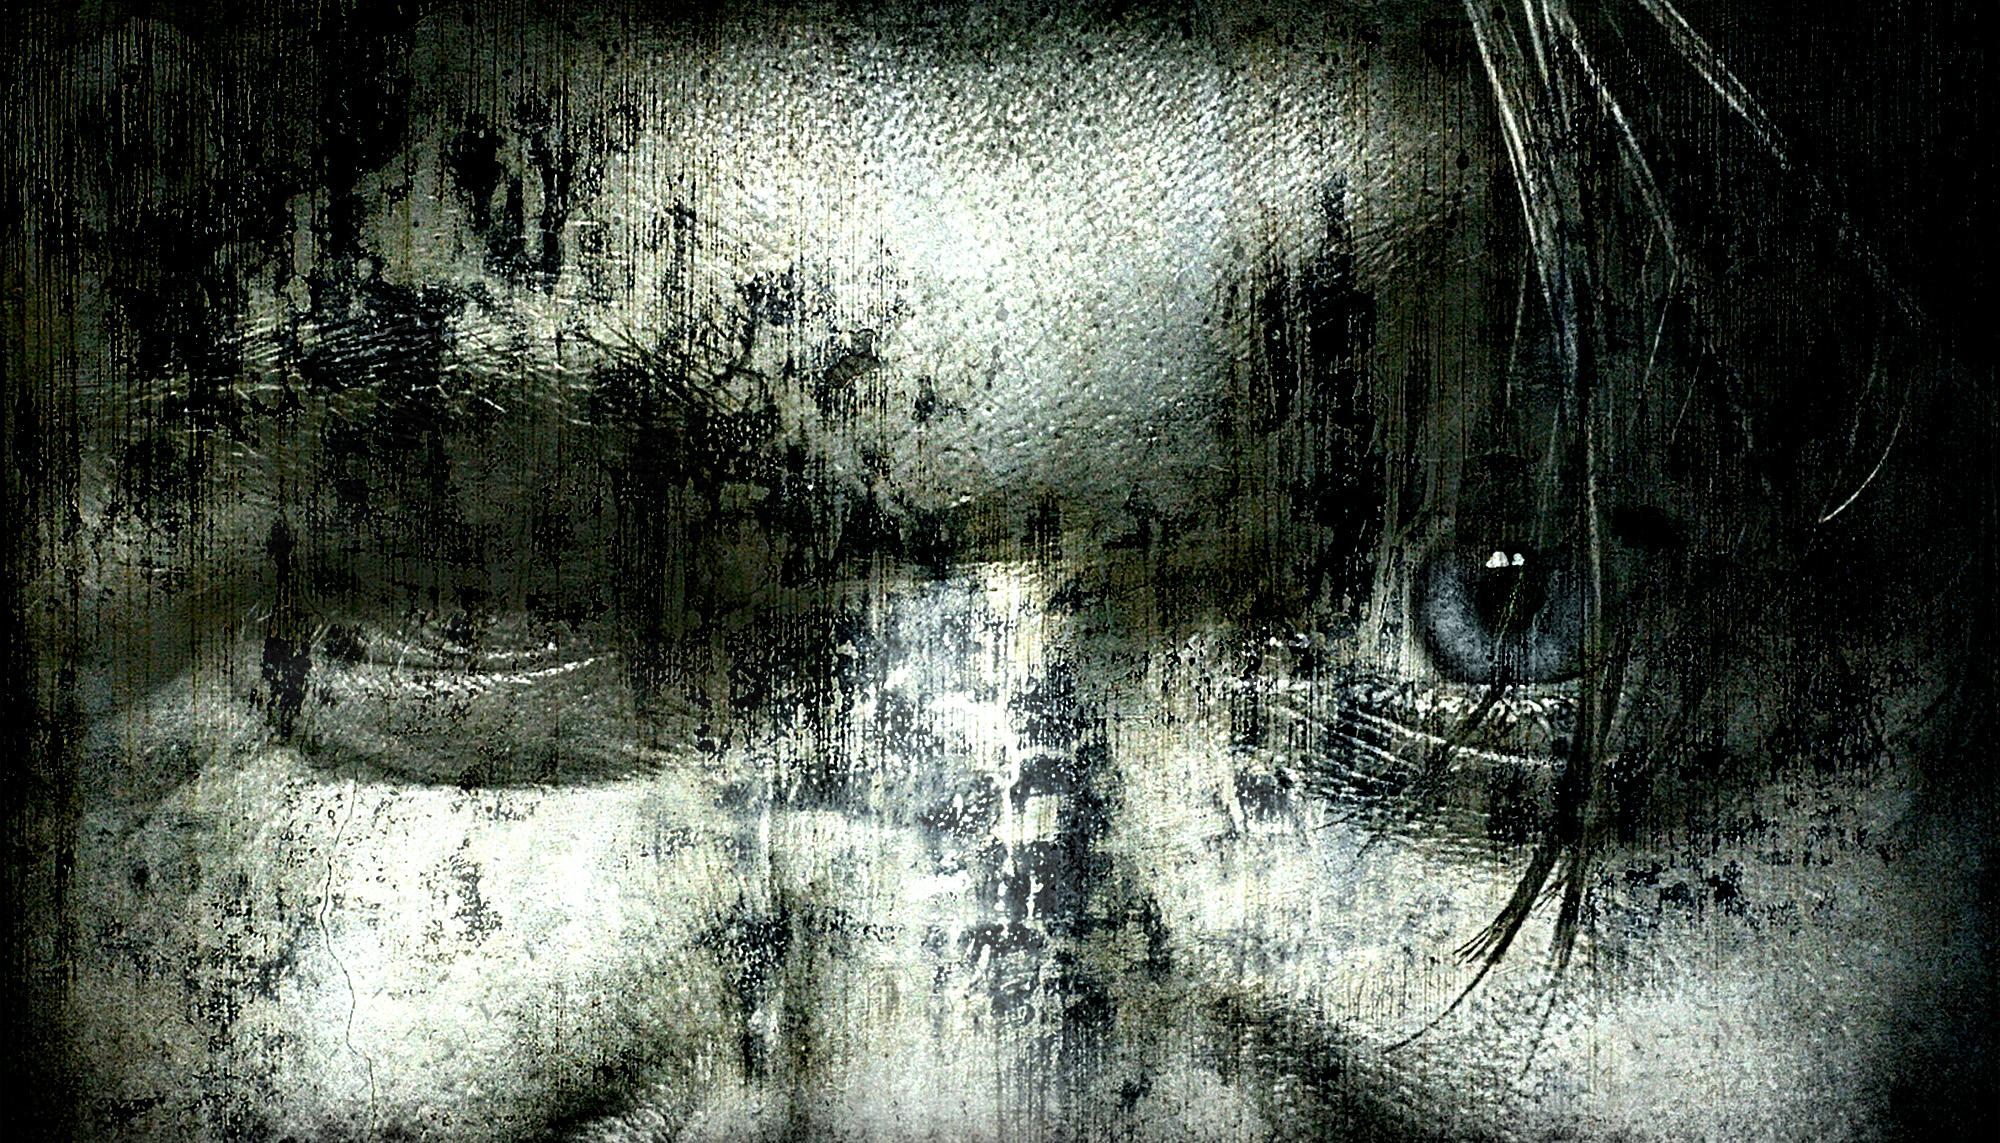 insanity-1428713